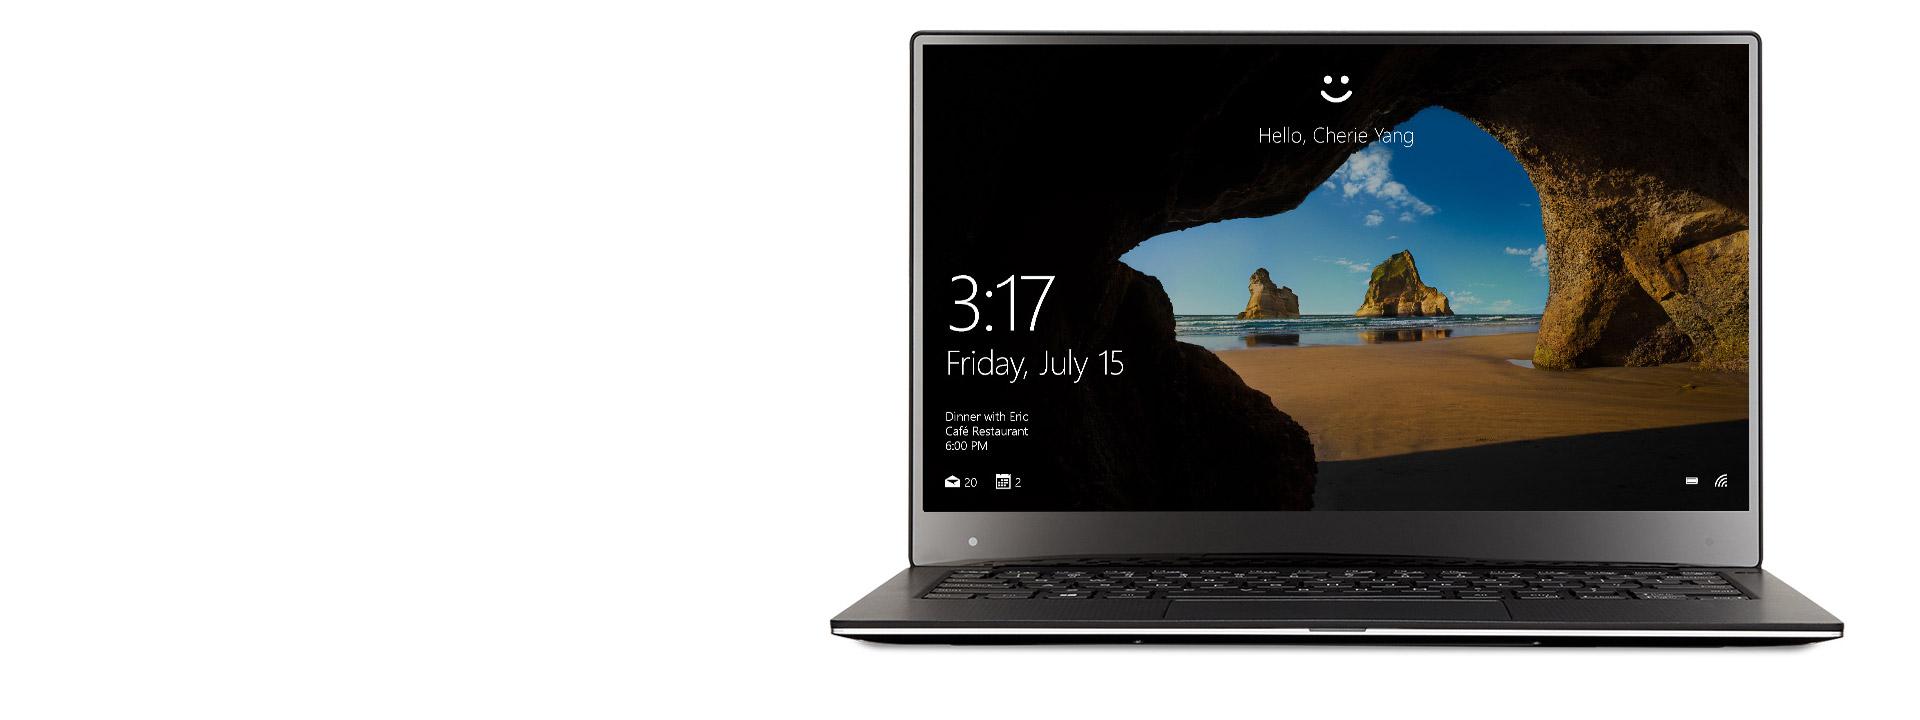 Windows Hello στο Dell XPS 13